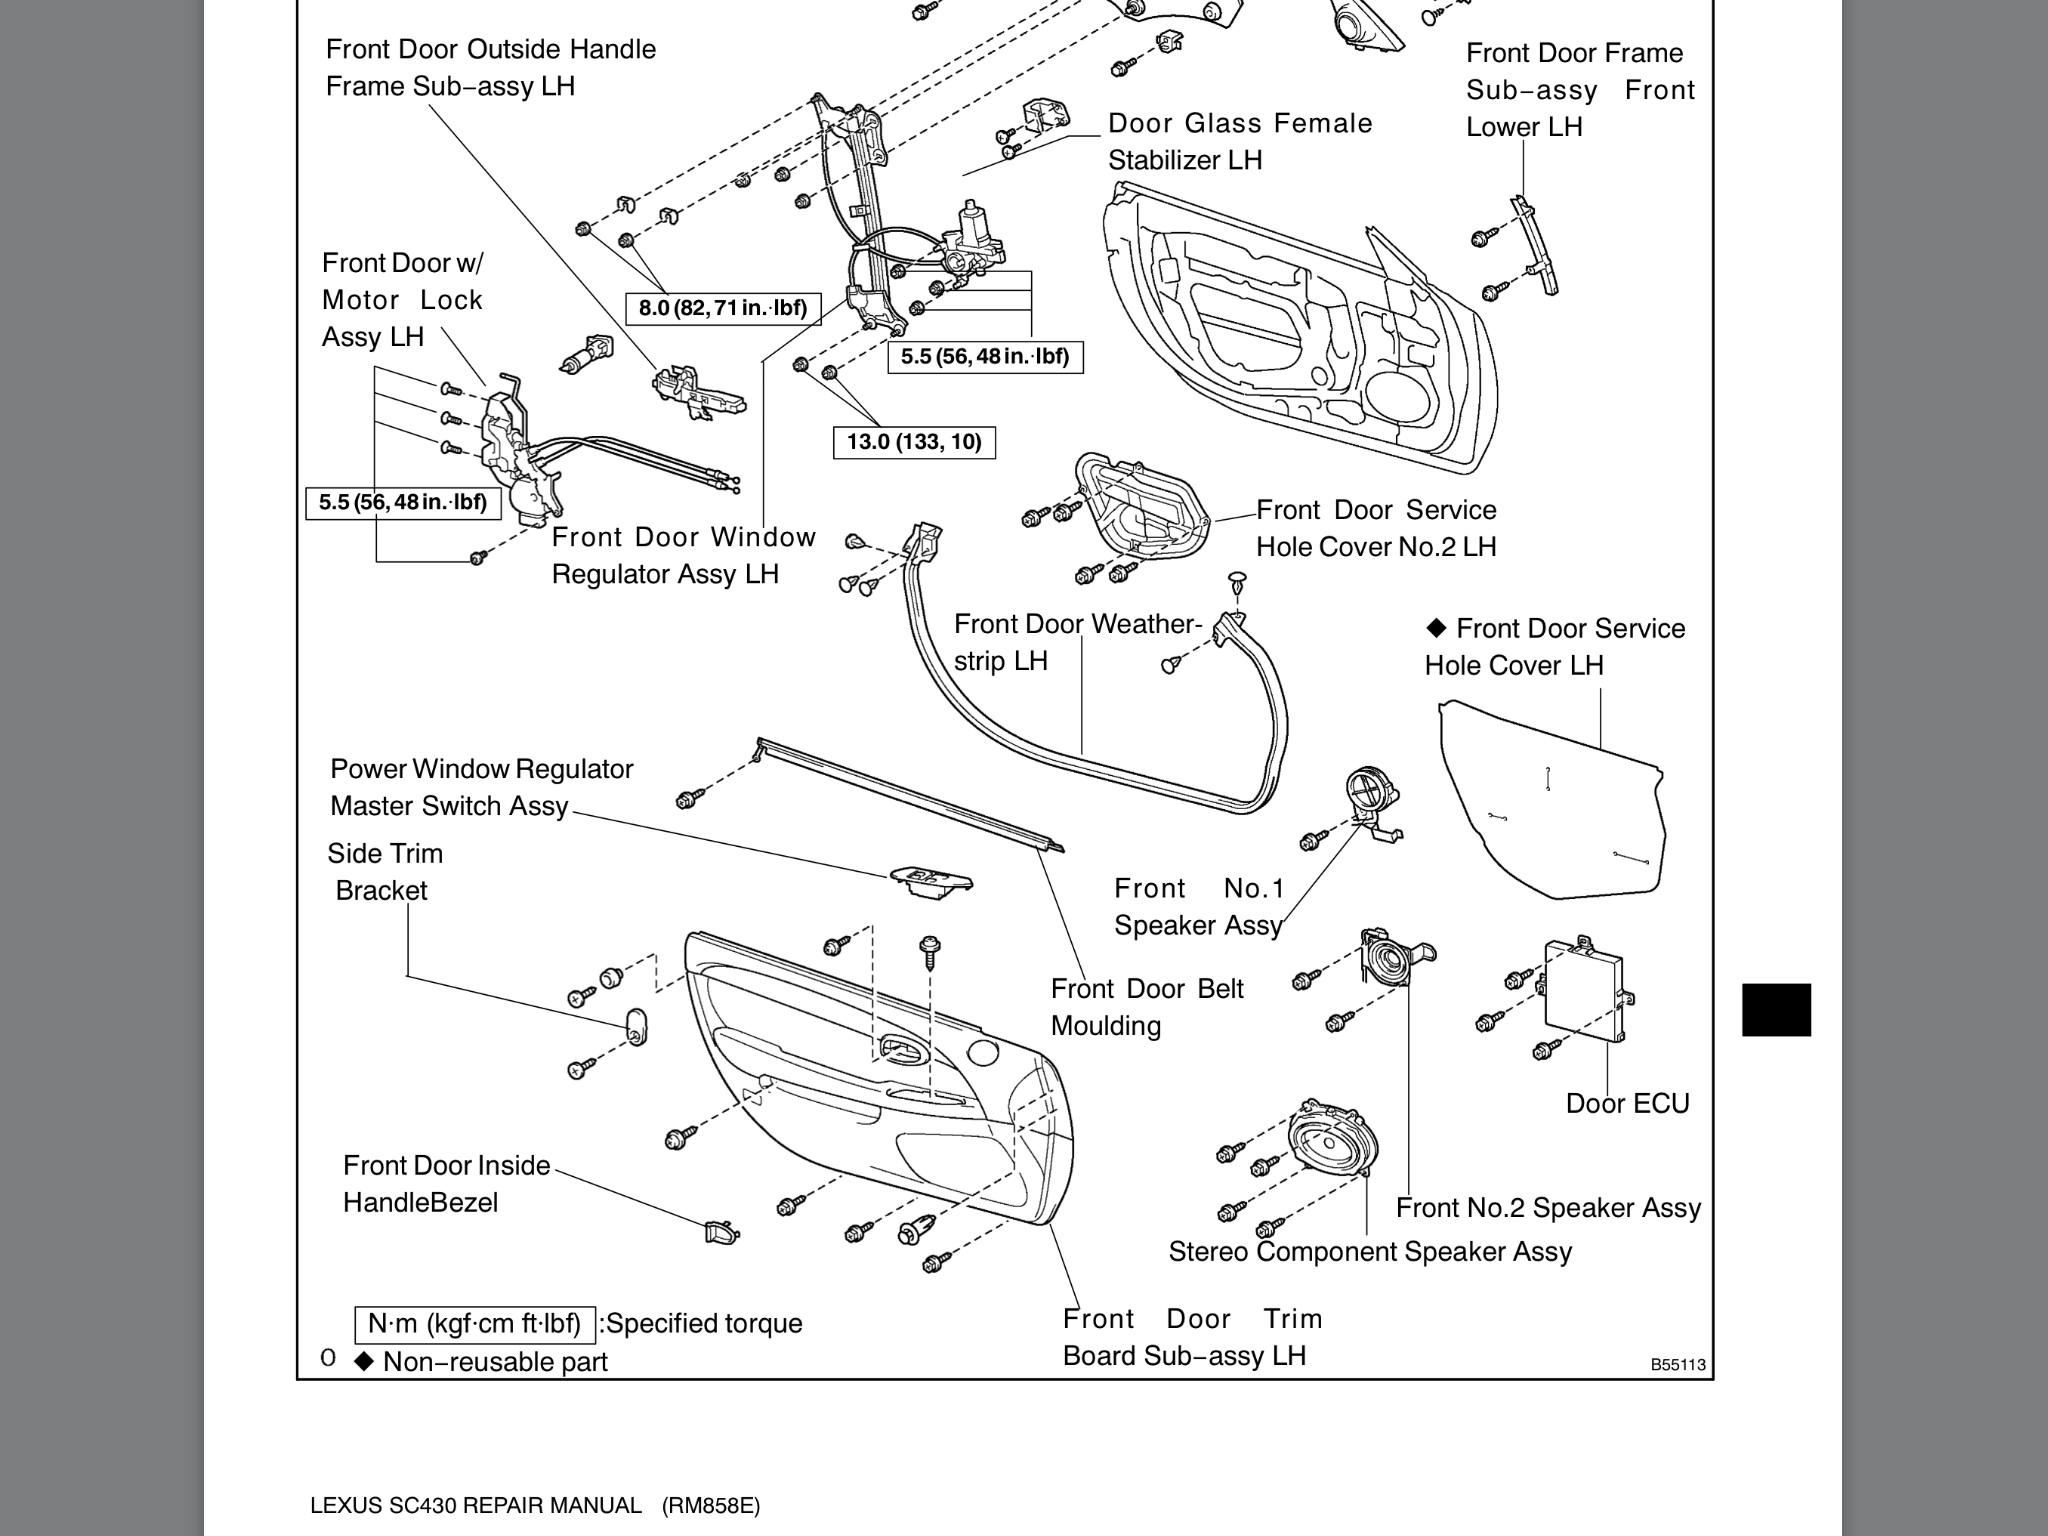 1999 volvo v70 glt repair manual pdf